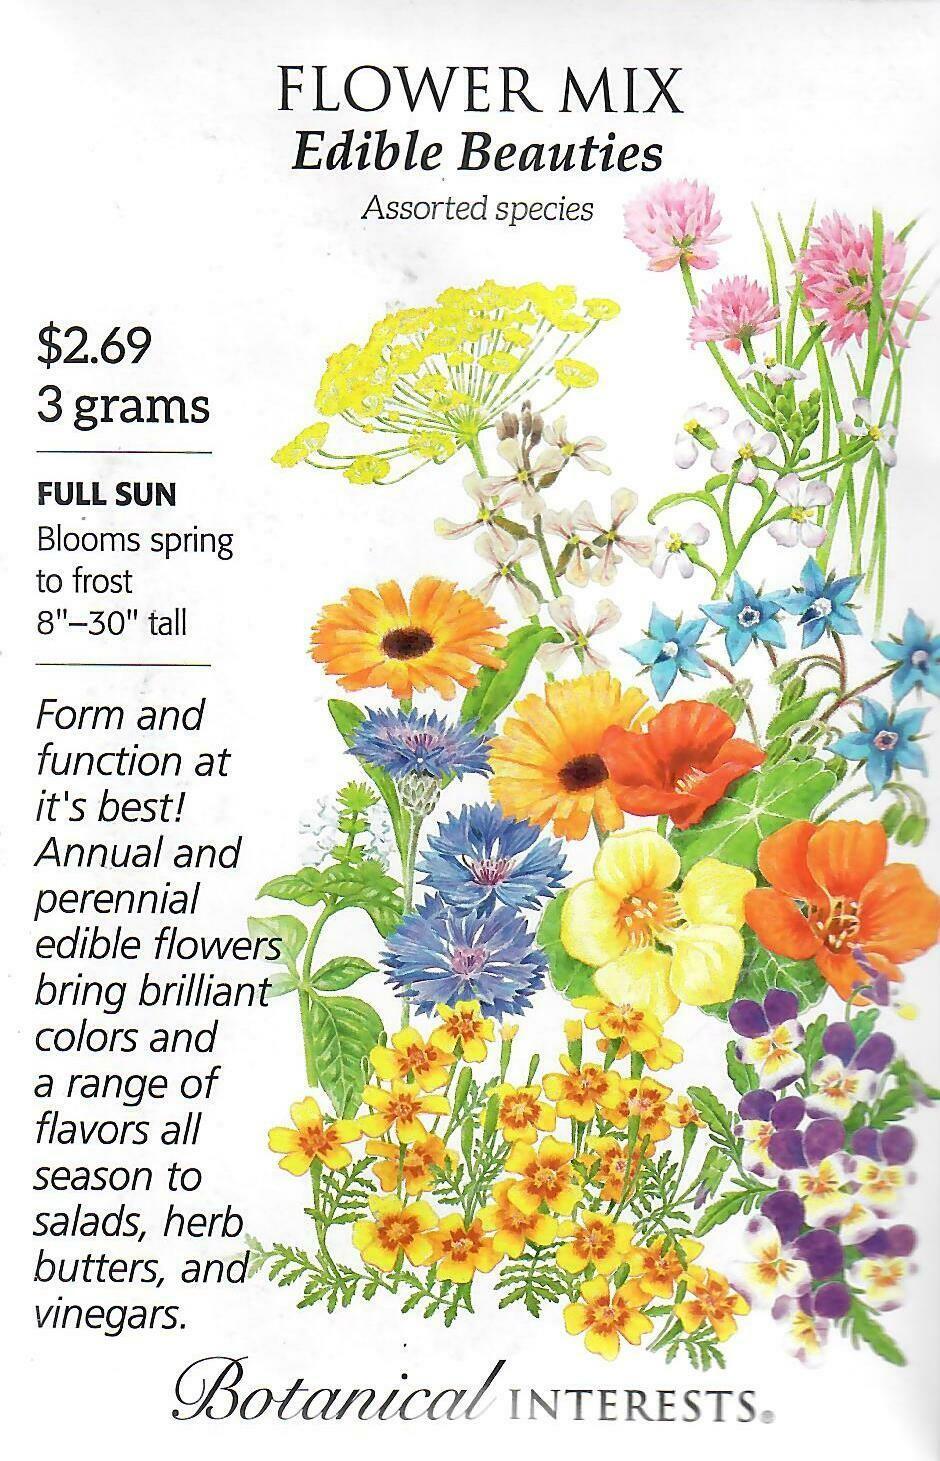 Flower Mix Edible Beauties Botanical Interests